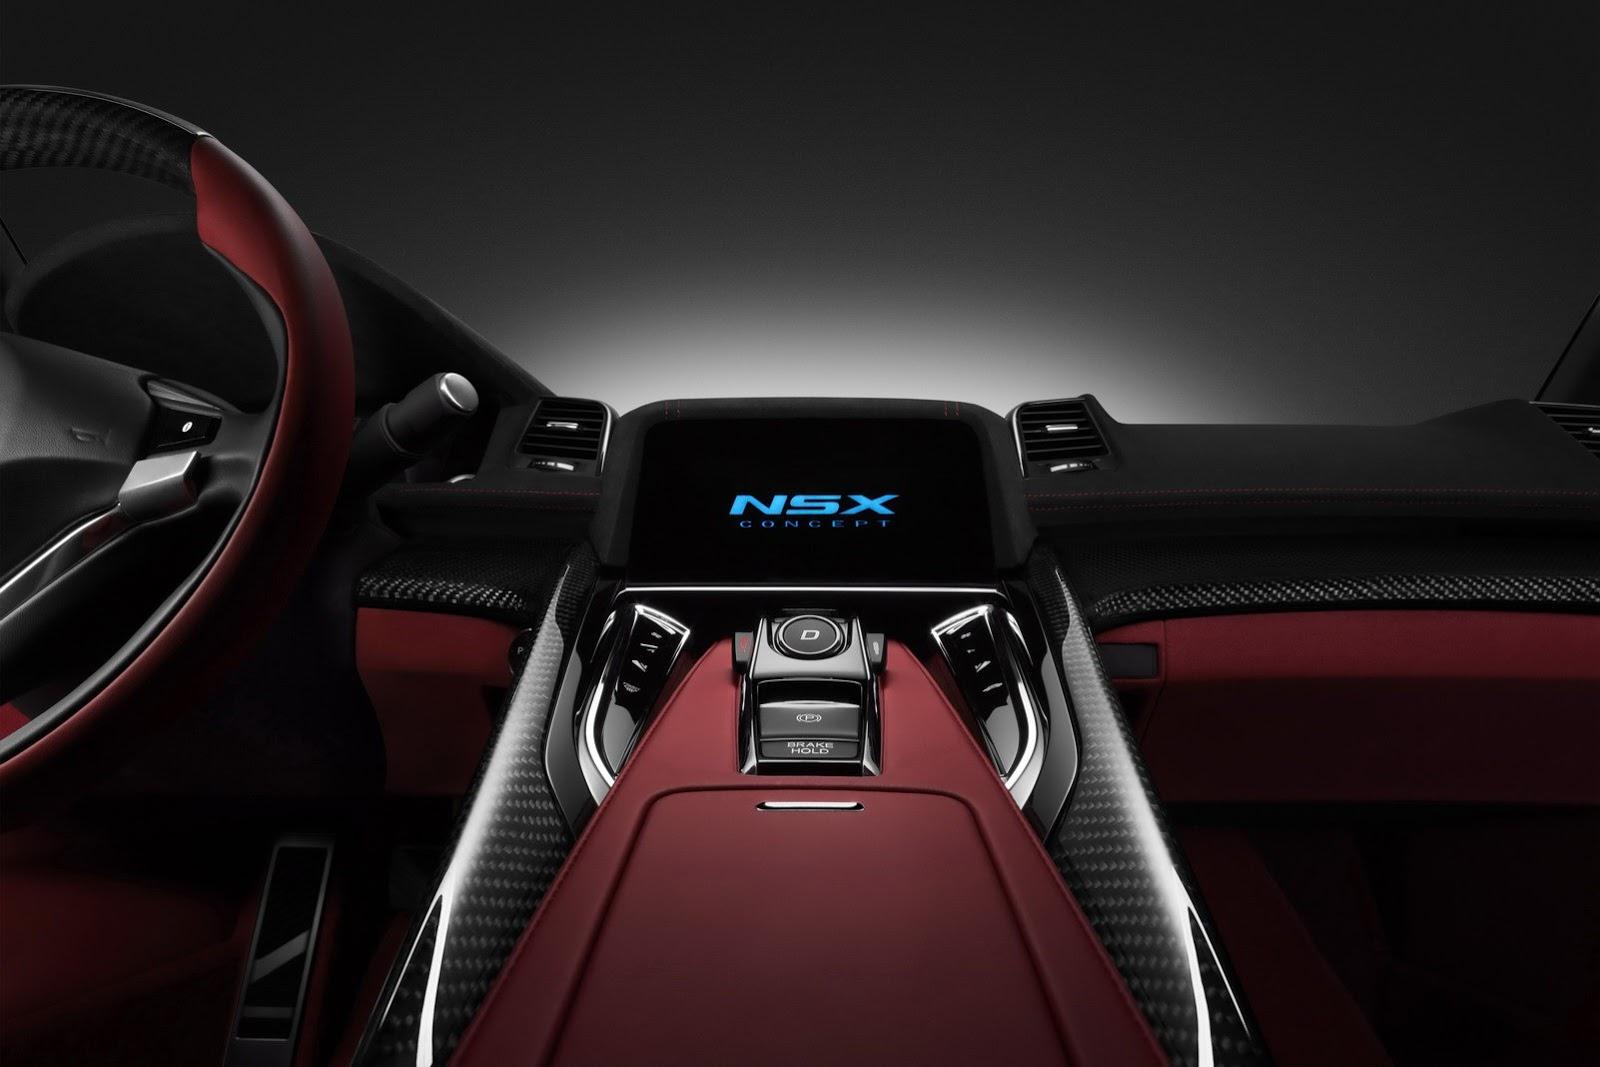 2015-Acura-Honda-NSX-Concept-II-22[2].jpg